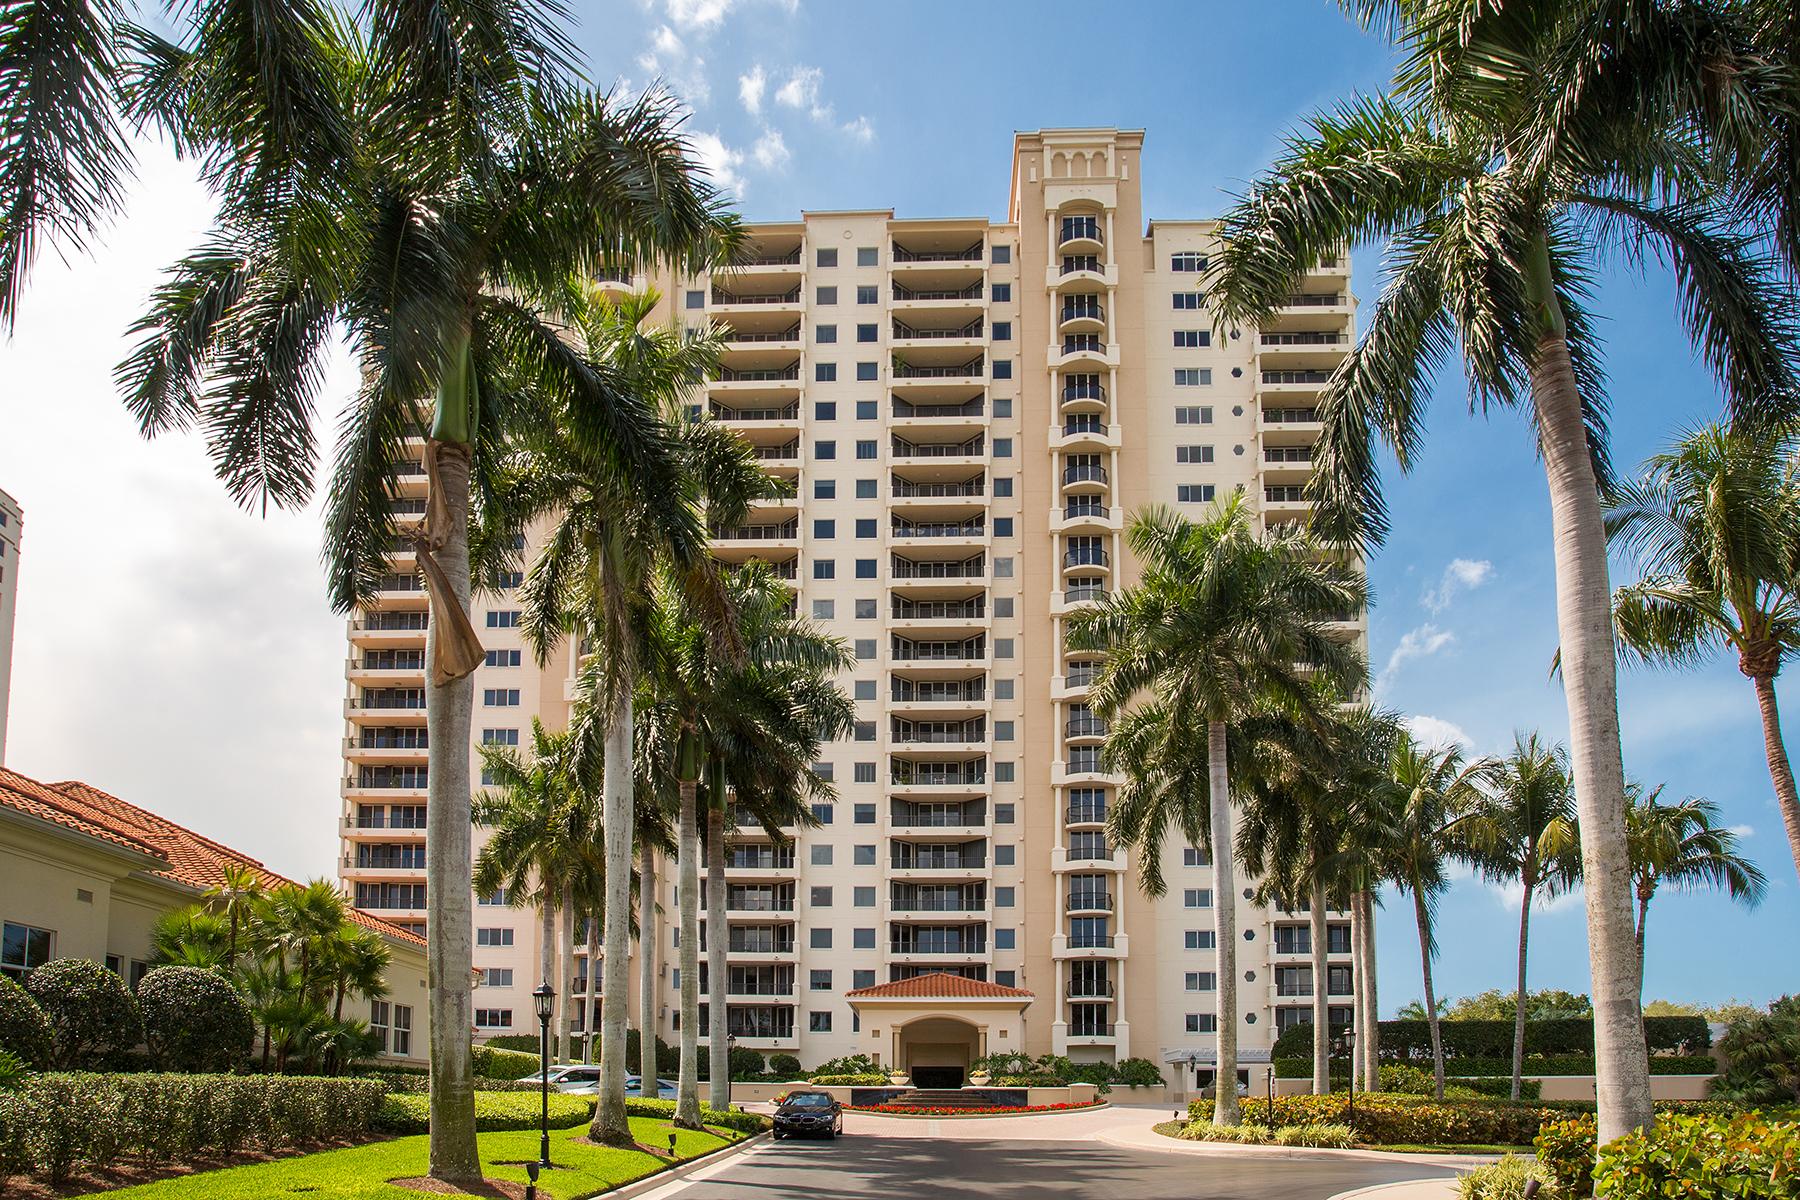 Condominium for Sale at PELICAN BAY - MARBELLA 7425 Pelican Bay Blvd 203 Naples, Florida, 34108 United States